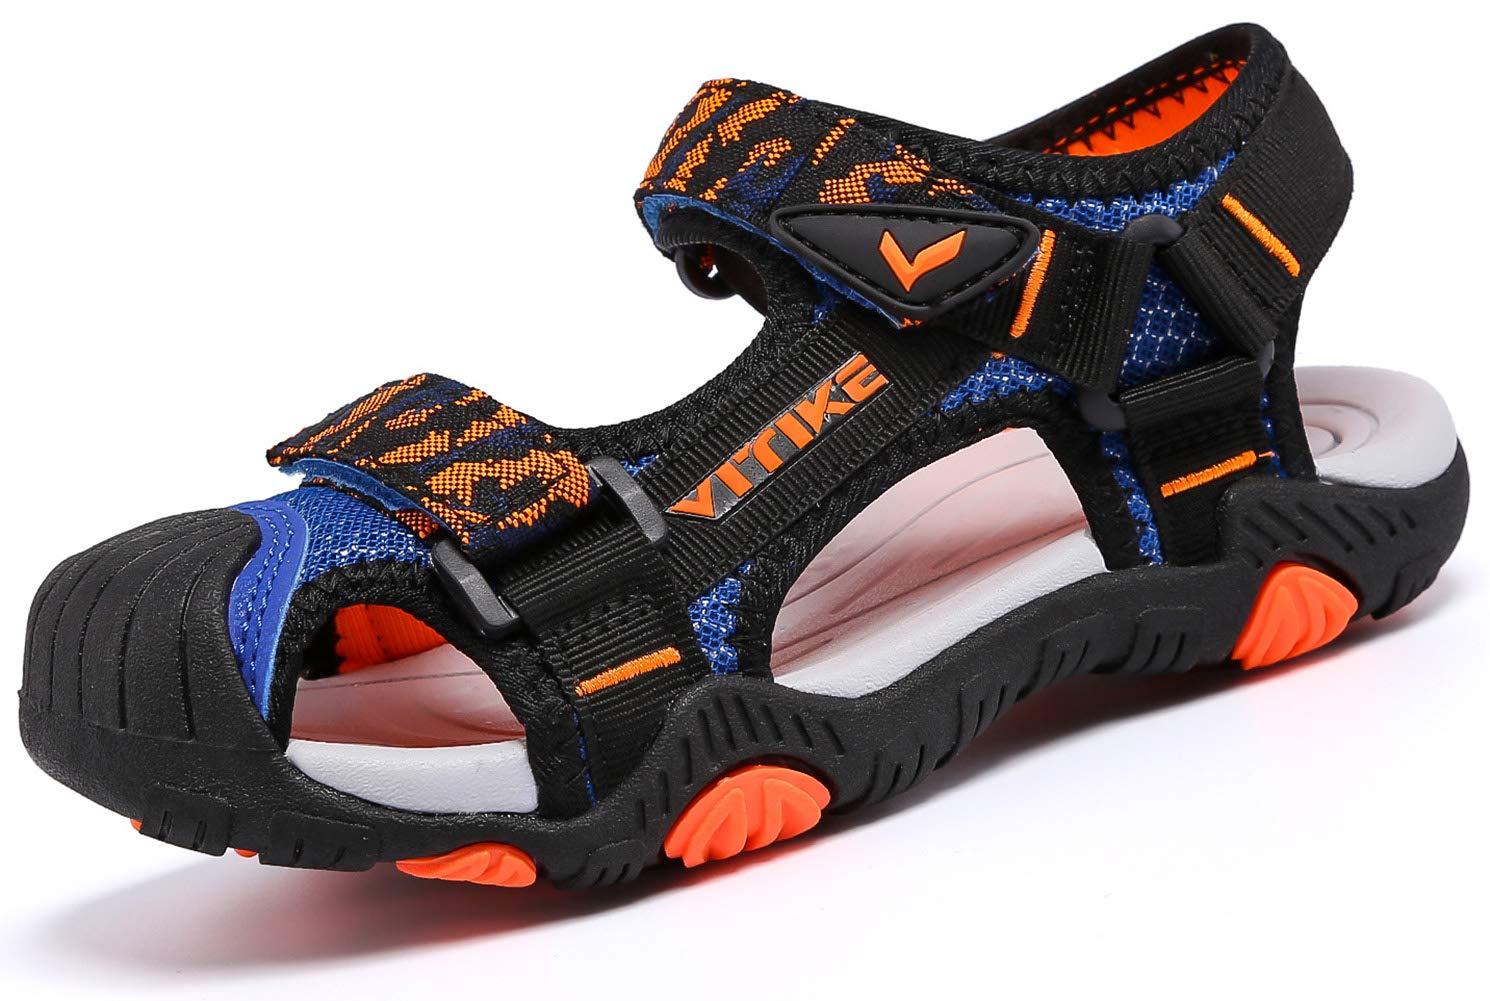 Littleplum Boys Girls Outdoor Sport Closed-Toe Sandals Kids Breathable Mesh Water Athletic Sandals Shoes Blue/Orange